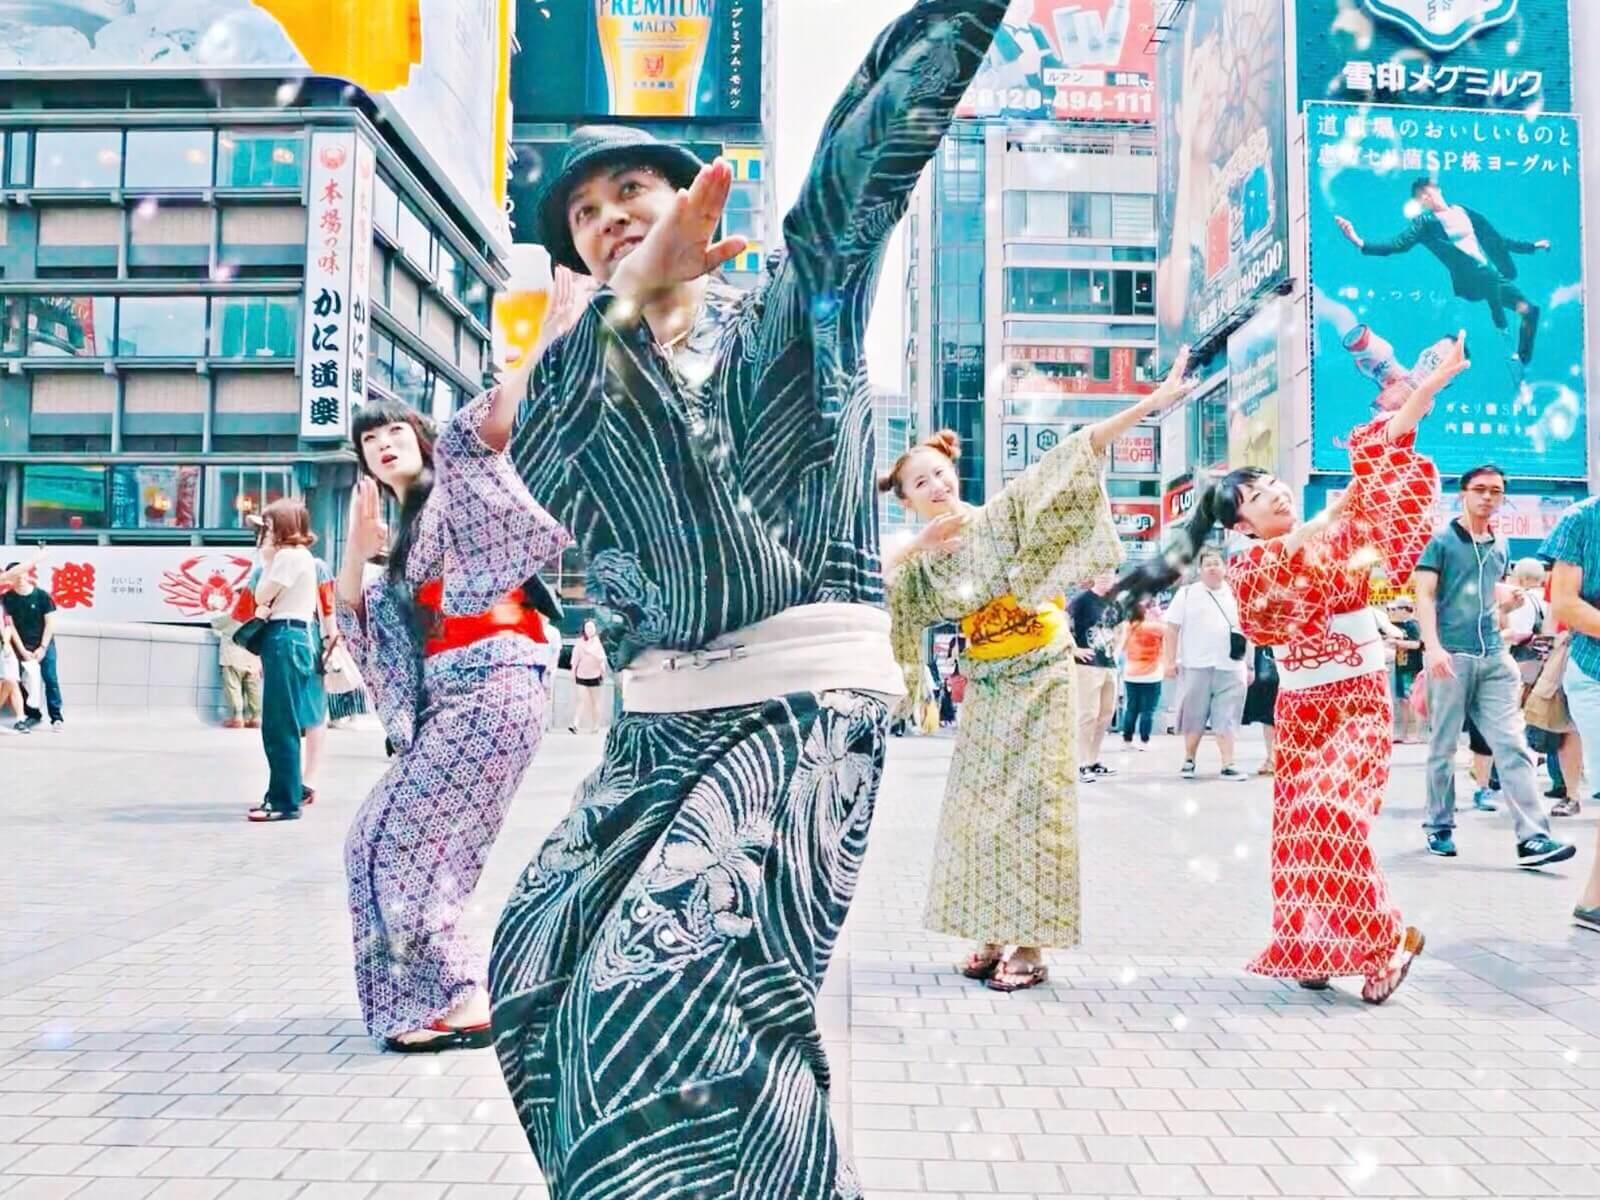 Tokyo Bon 2020 (Makudonarudo) video world craze viewed more than 10